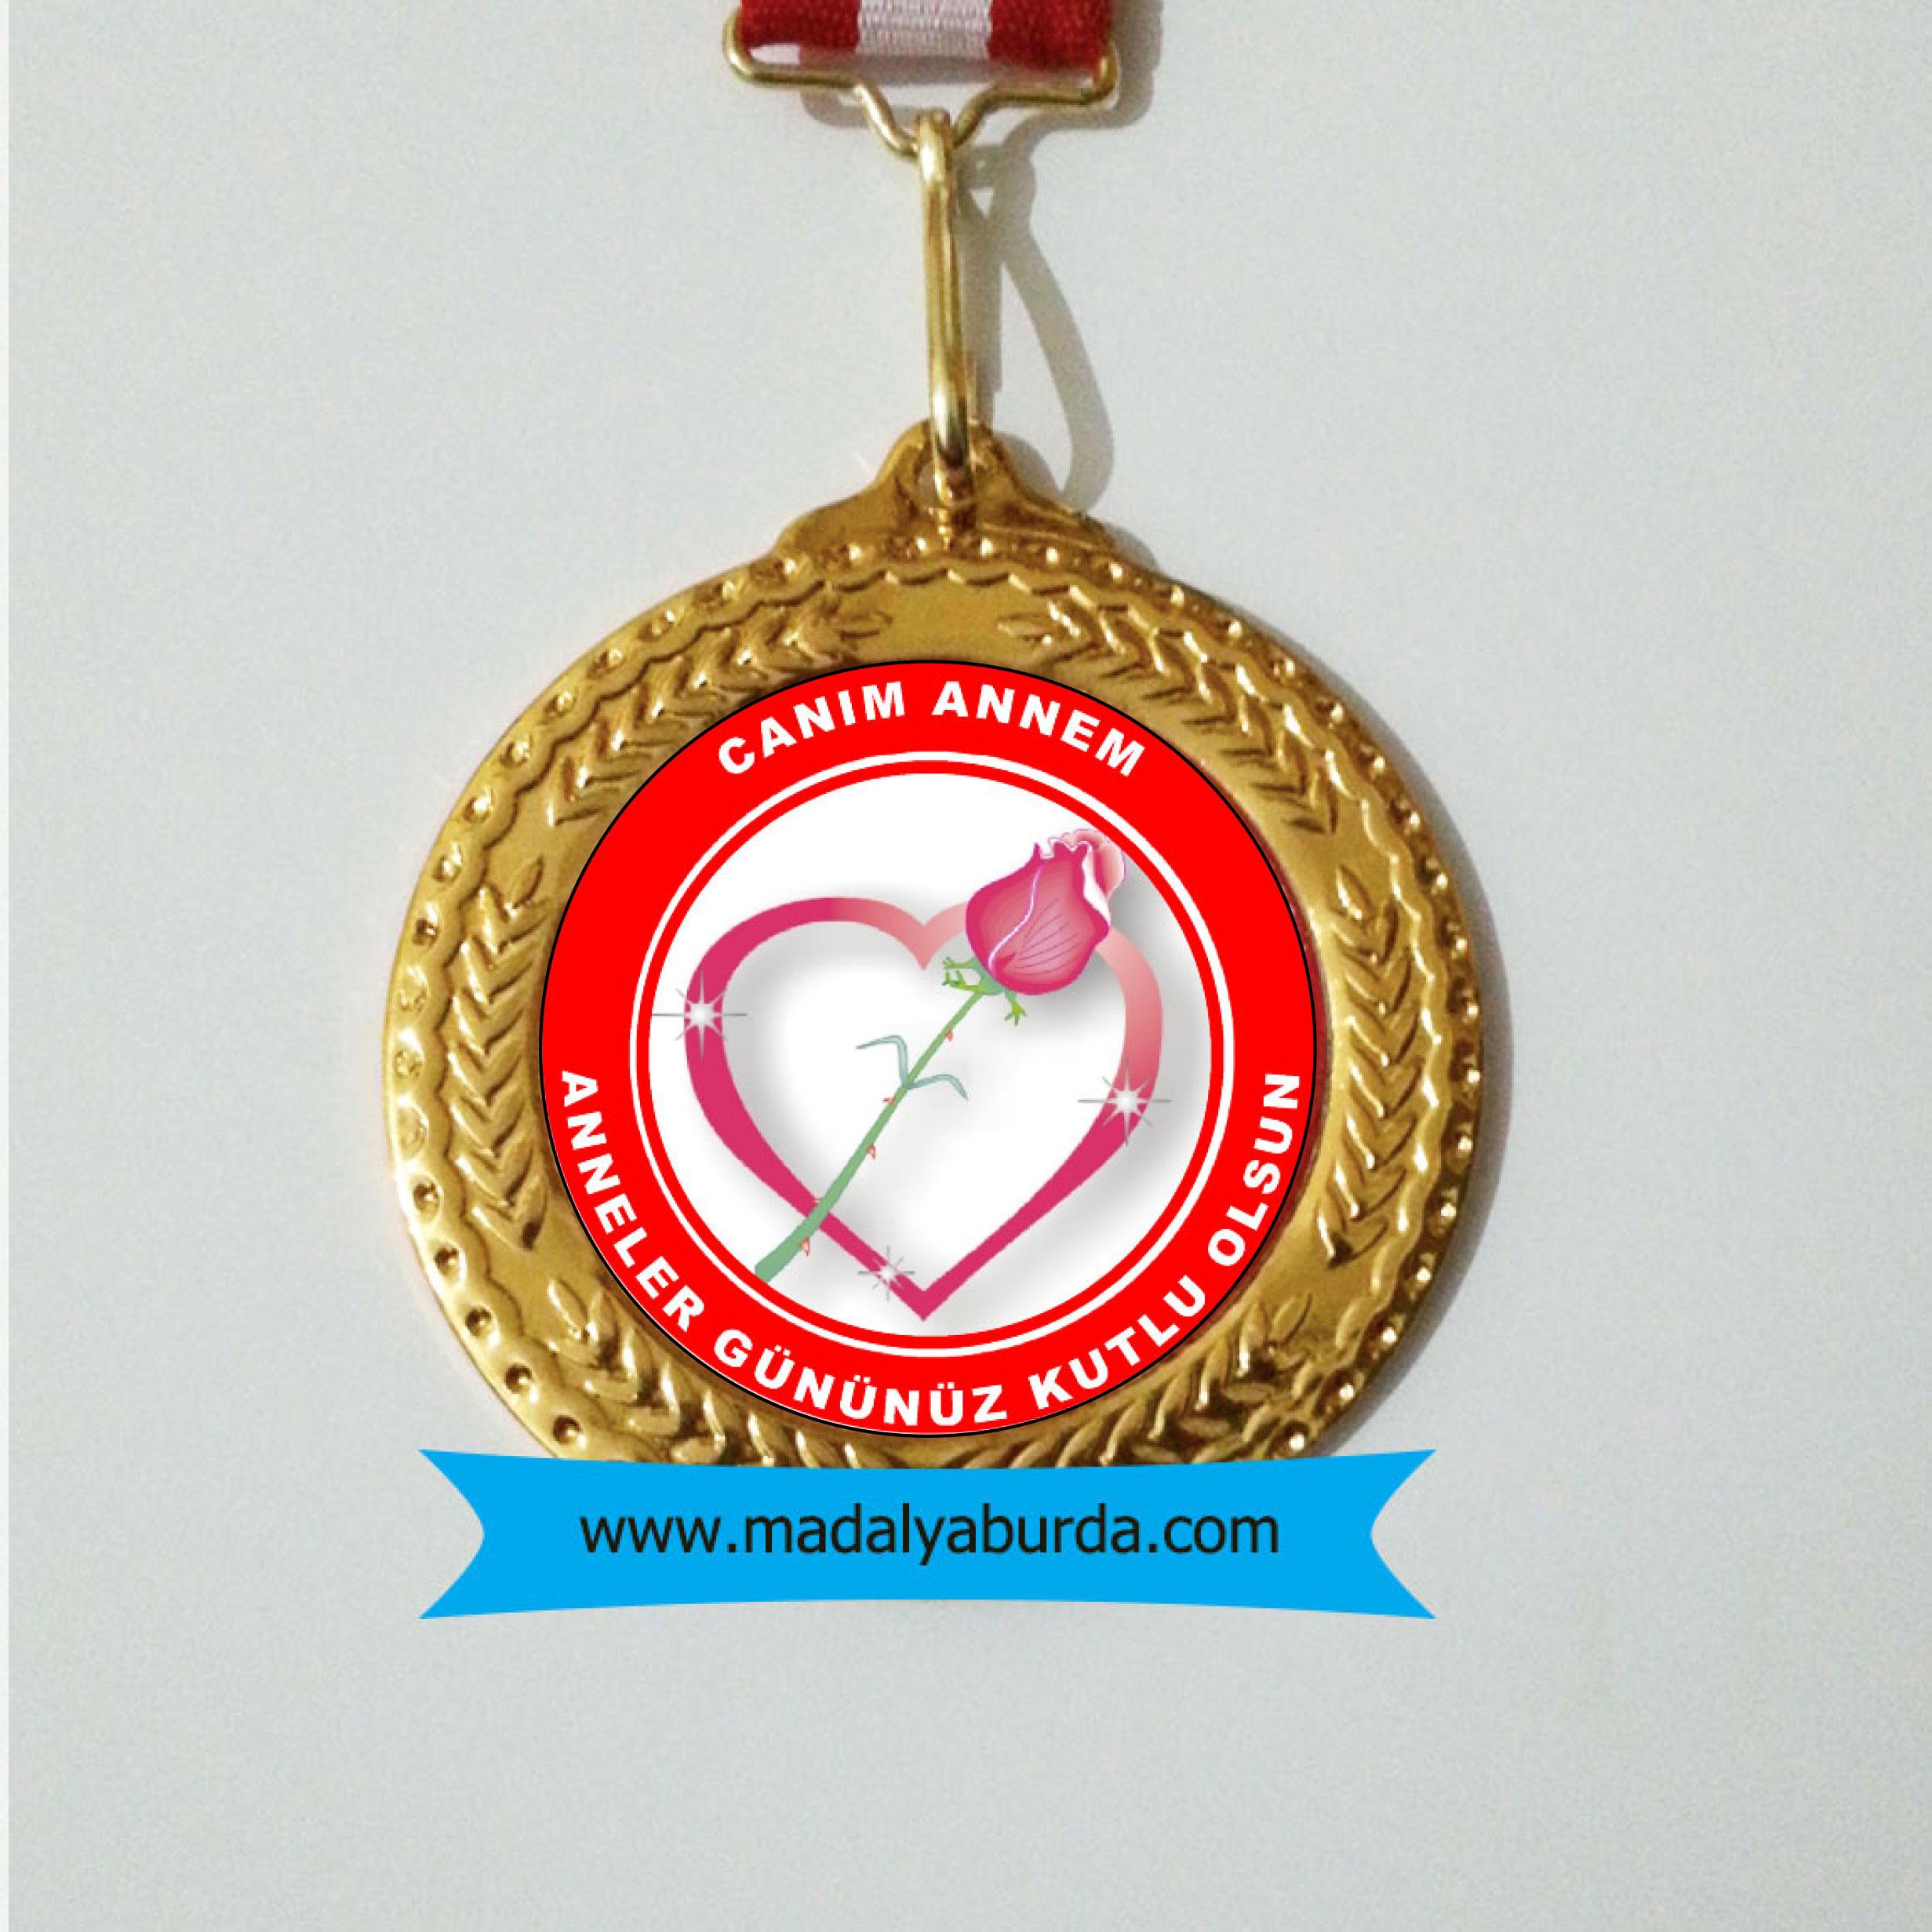 anneler-günü-madalyası,anneler günü madalyası,anneler günü ödülü, anneler günü,anneler günü hediyesi,anneler günü kutlama,anneler günü madalyası yapılır,madalya,madalyalar, okul madalyası, madalya yaptırma, ucuz madalya, madalya fiyatları, en ucuz madalya fiyatları, anaokulu madalyası, anaokulu madalyaları, anaokulu madalyası yapılır, kitap kurdu madalyaları, kitap kurdu madalyası, kitap kurdu madalyası yapılır, madalya yaptırma fiyatları, madalyaburda,madalyacı,okul madalya örneği, okul madalya örneği,örnek okul madalyası, okul madalya yaptırma yeri, okul madalyaları,madalya yaptırma yeri okul madalyaları yapılır,madalyacılar okuma bayramı madalyası, okuma bayramı başarı madalyası, okuma bayramı madalyaları, okuma bayramı madalyaları yapılır, toptan başarı madalyaları, toptan madalya, toptan ucuz madalyalar, ucuz başarı madalyaları, ucuz madalya yapılır, ucuz madalyalar, resimli madalya, isimli madalya,